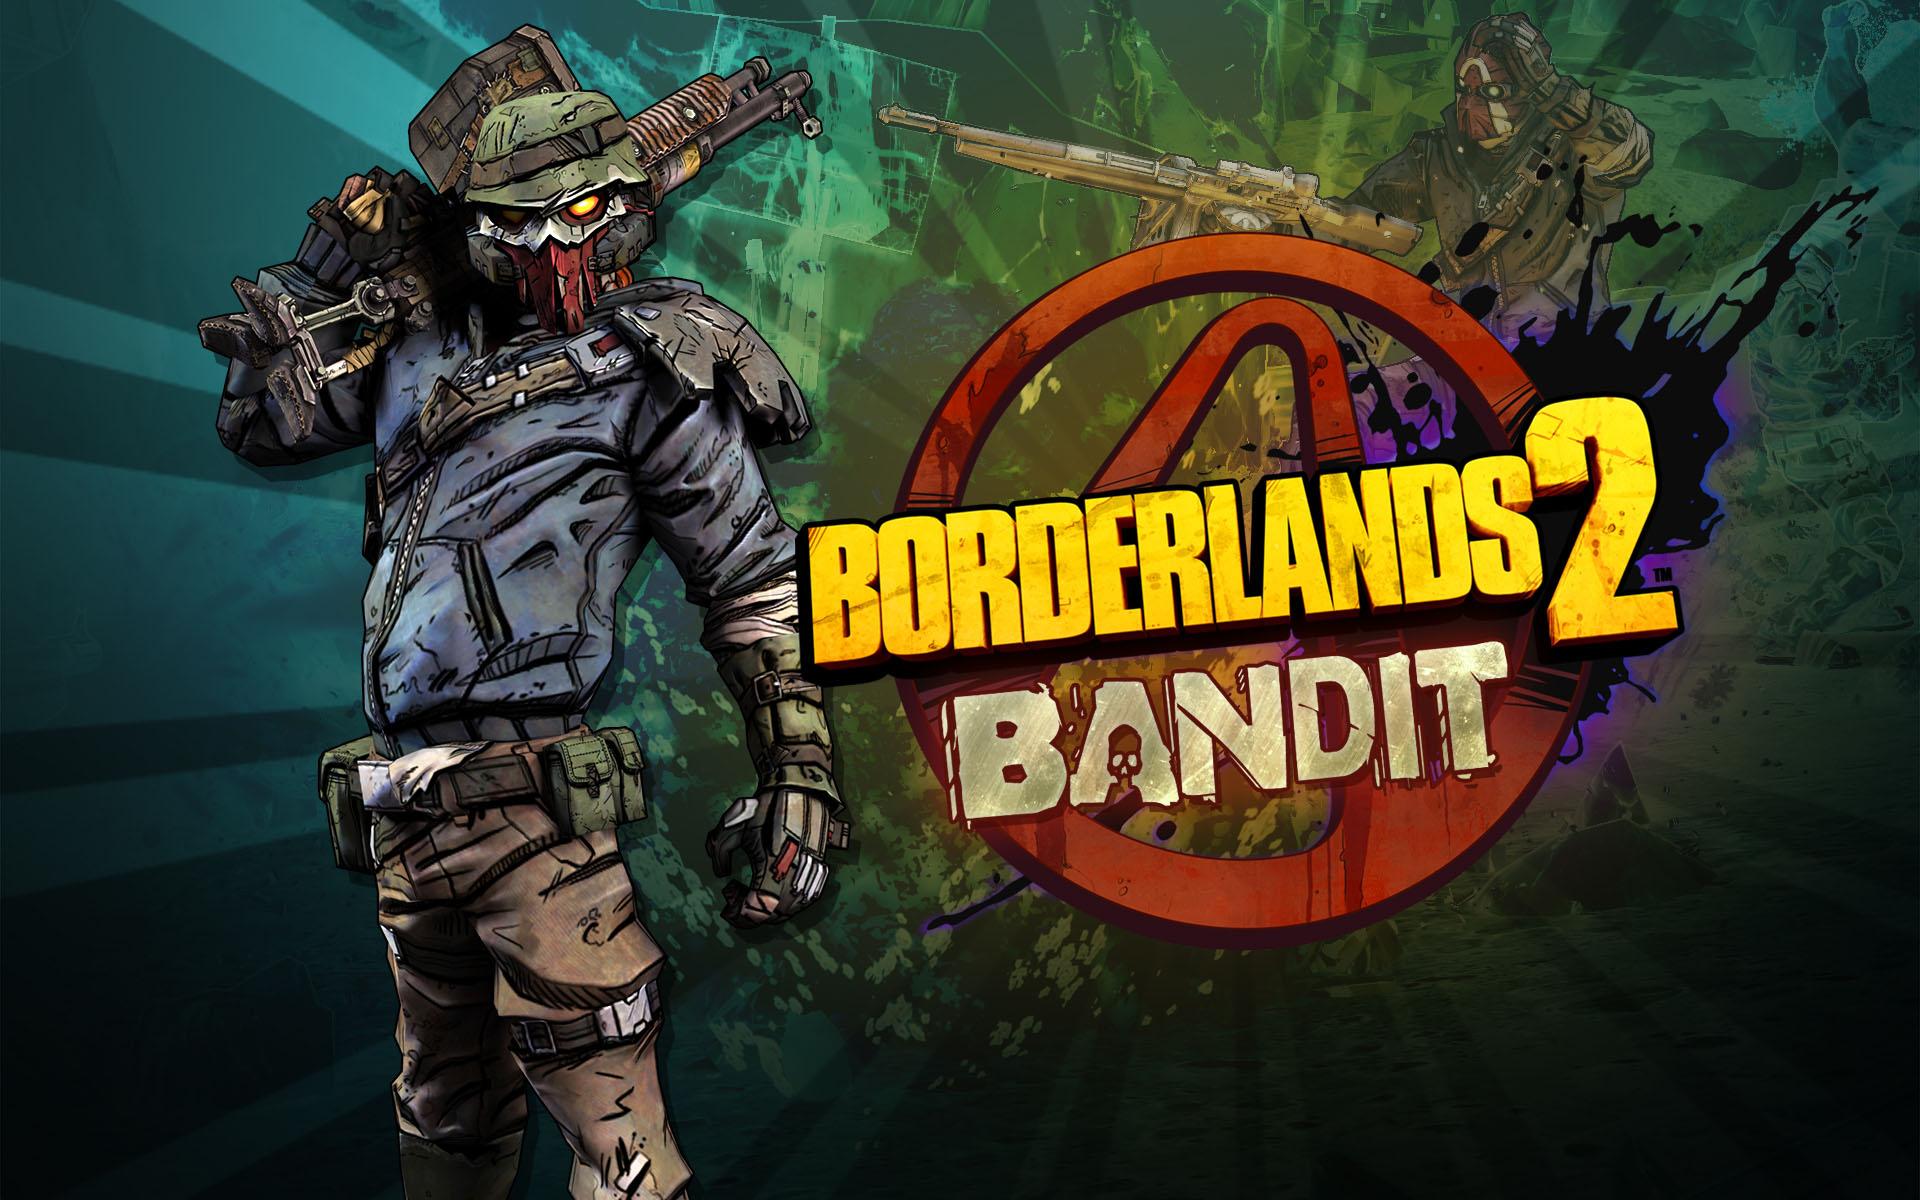 Borderlands 2 full hd wallpaper and background image 1920x1200 video game borderlands 2 wallpaper voltagebd Image collections